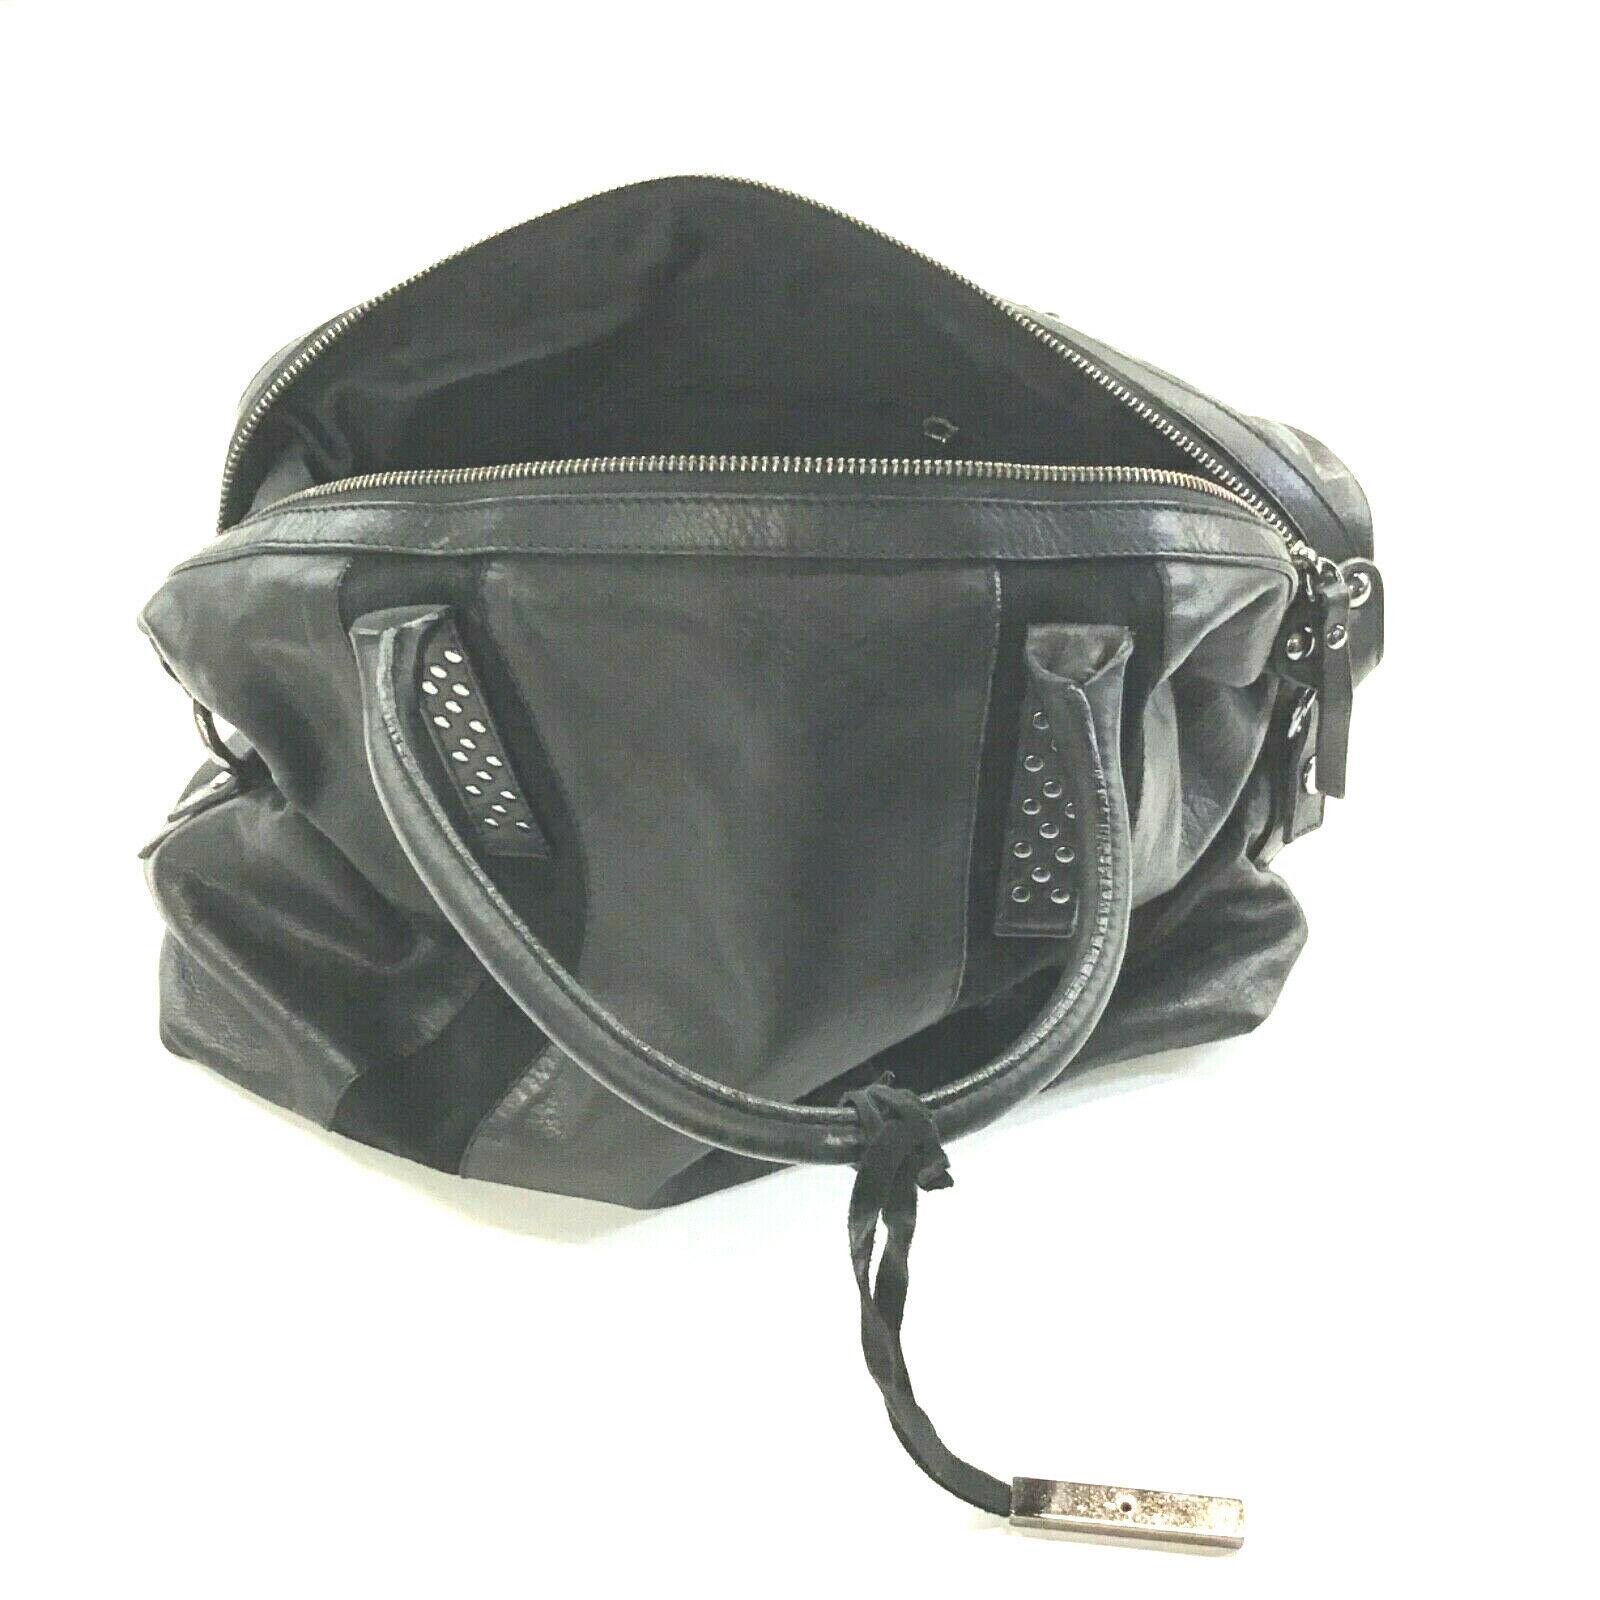 INNUE Women's Genuine Leather Handbag Black w/Front Suede